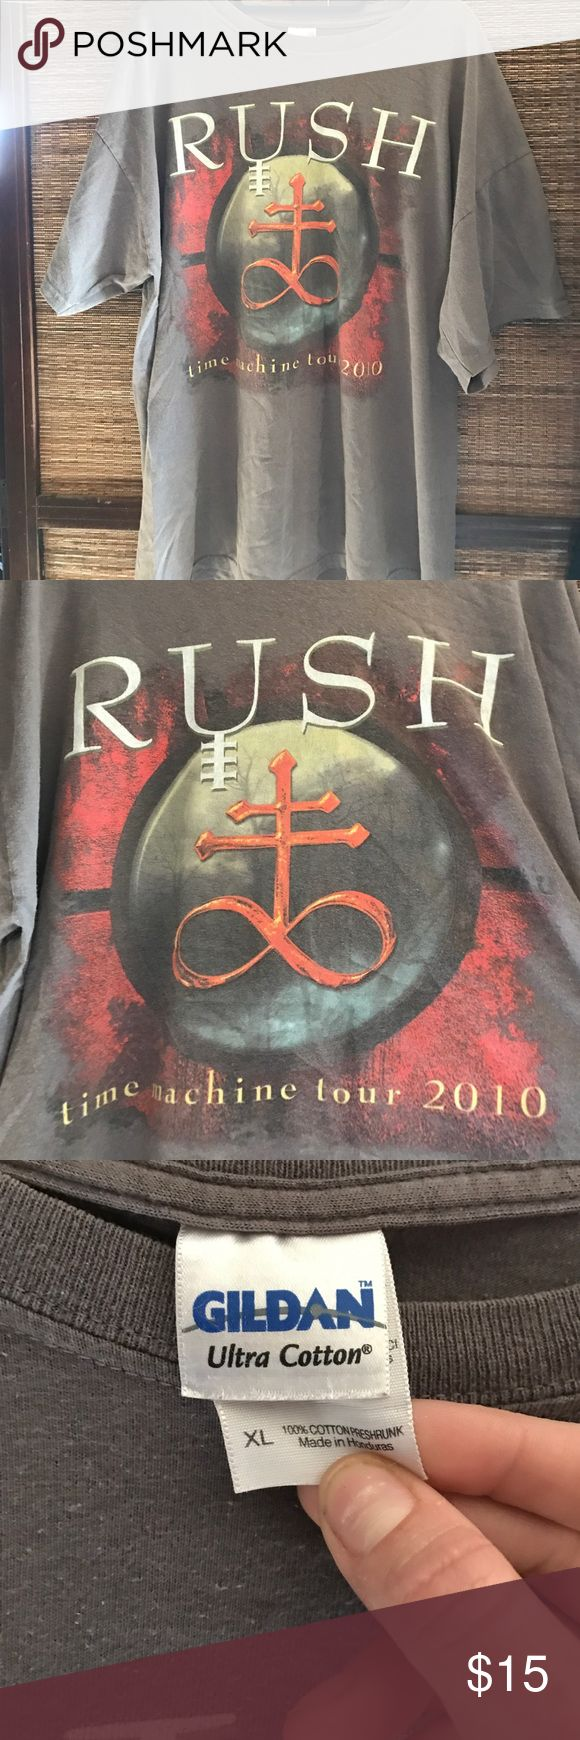 RUSH Concert T-Shirt Time Machine Tour 2010 RUSH Concert T-Shirt Time Machine Tour 2010, perfect condition, Sz XL Shirts Tees - Short Sleeve